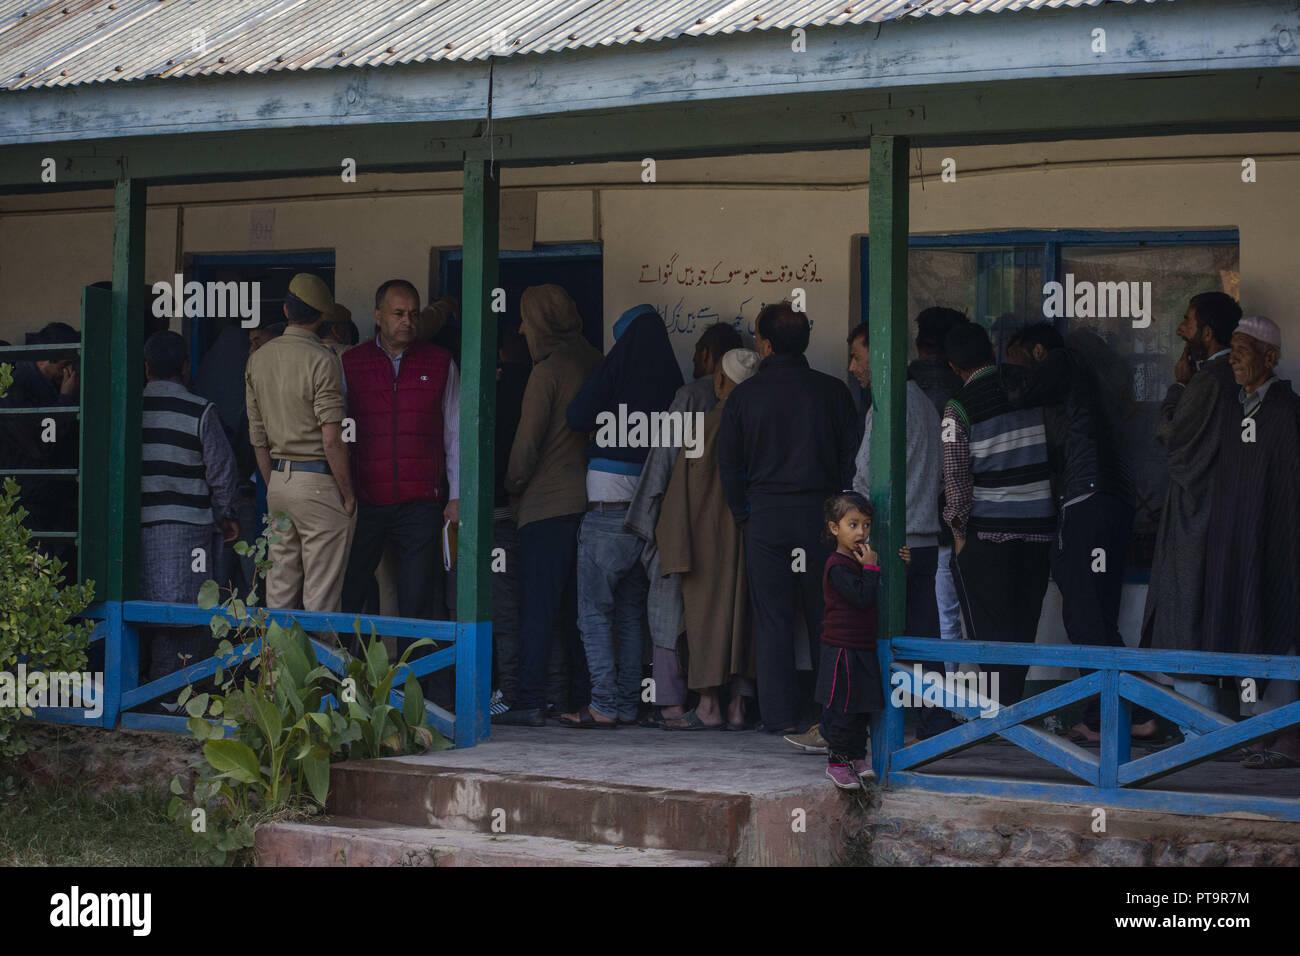 Srinagar, Indian Administered Kashmir, India  8th Oct, 2018